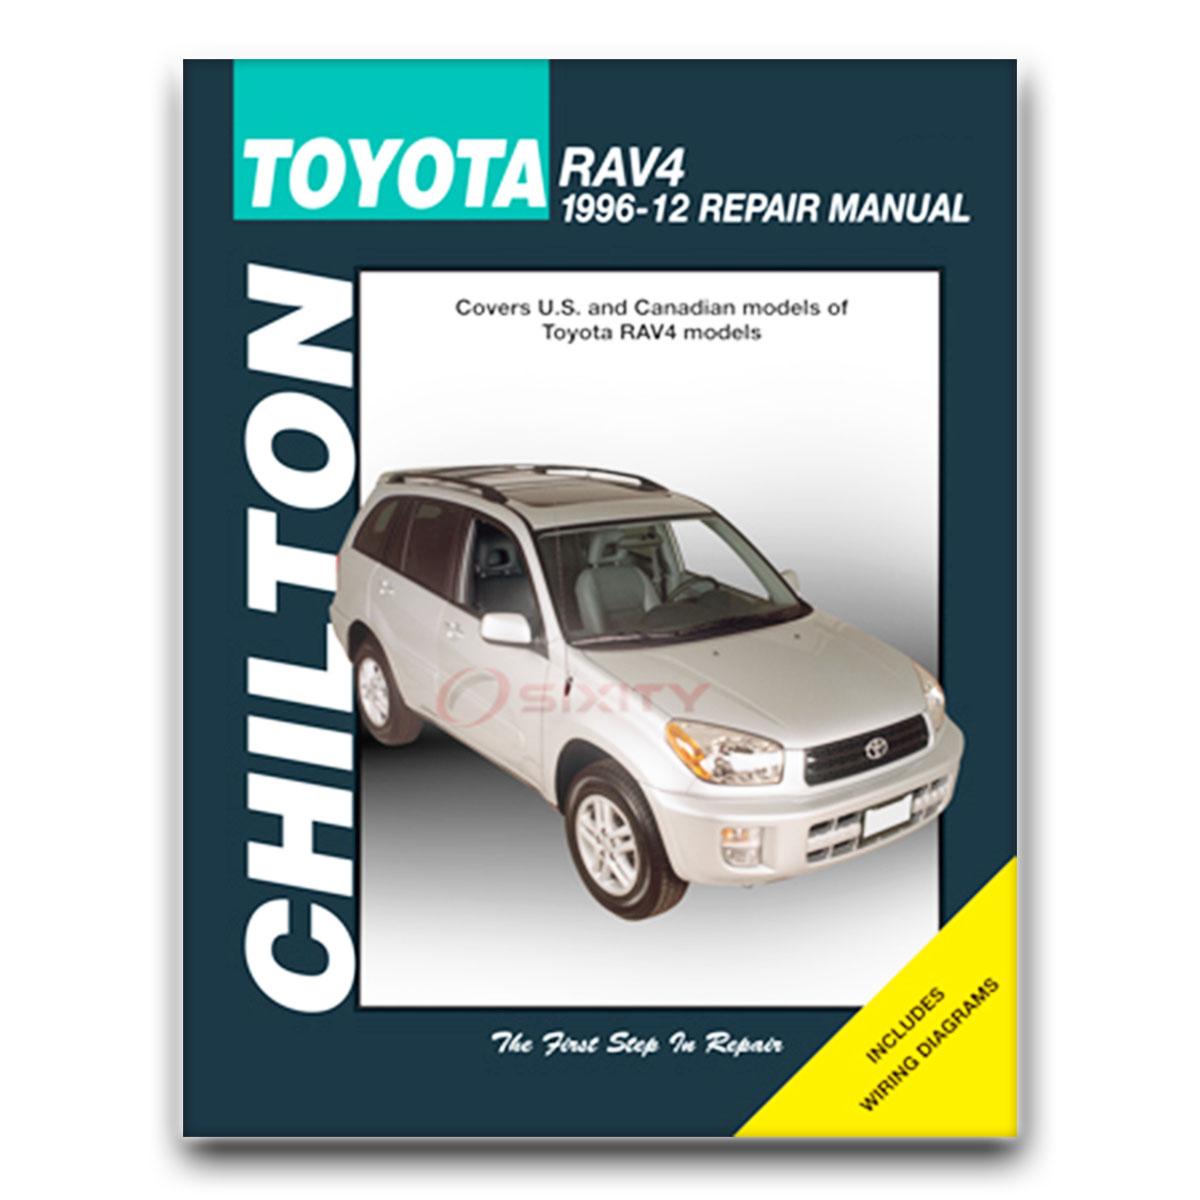 Toyota RAV4 Service Manual: Can communication system